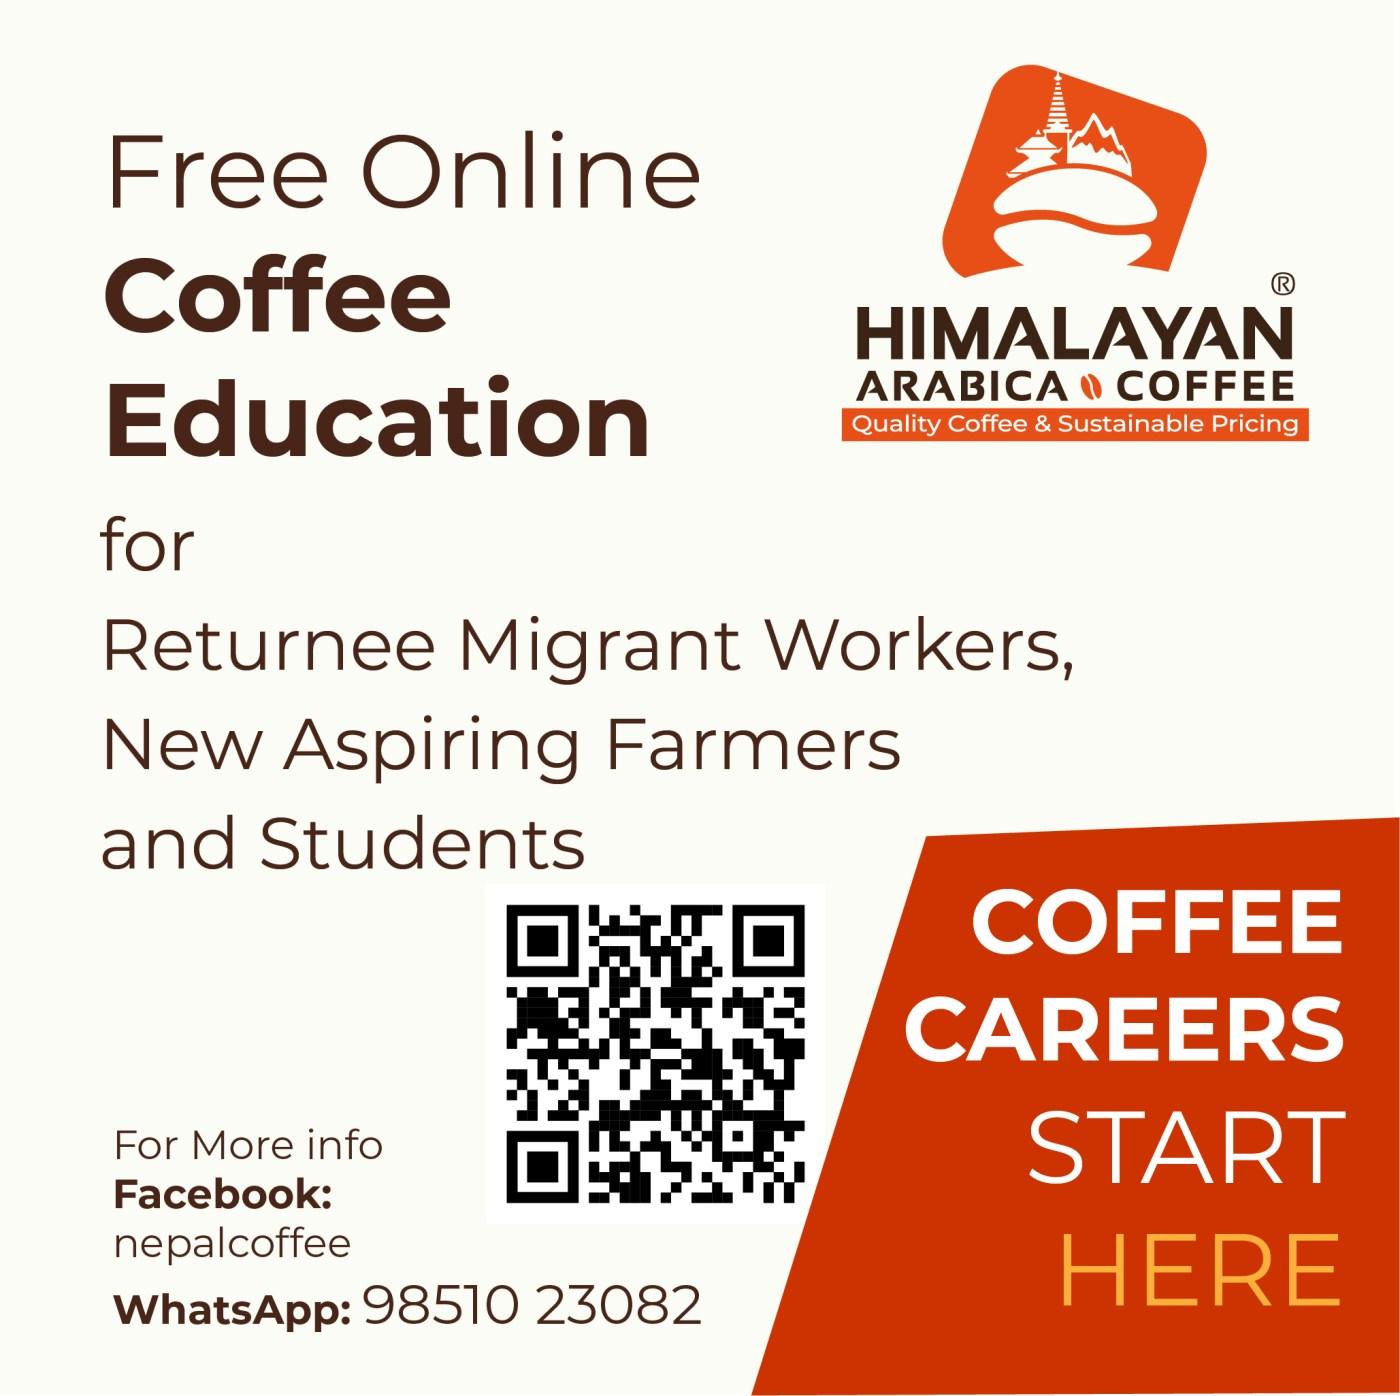 free coffee training for coffee farmers in Nepal